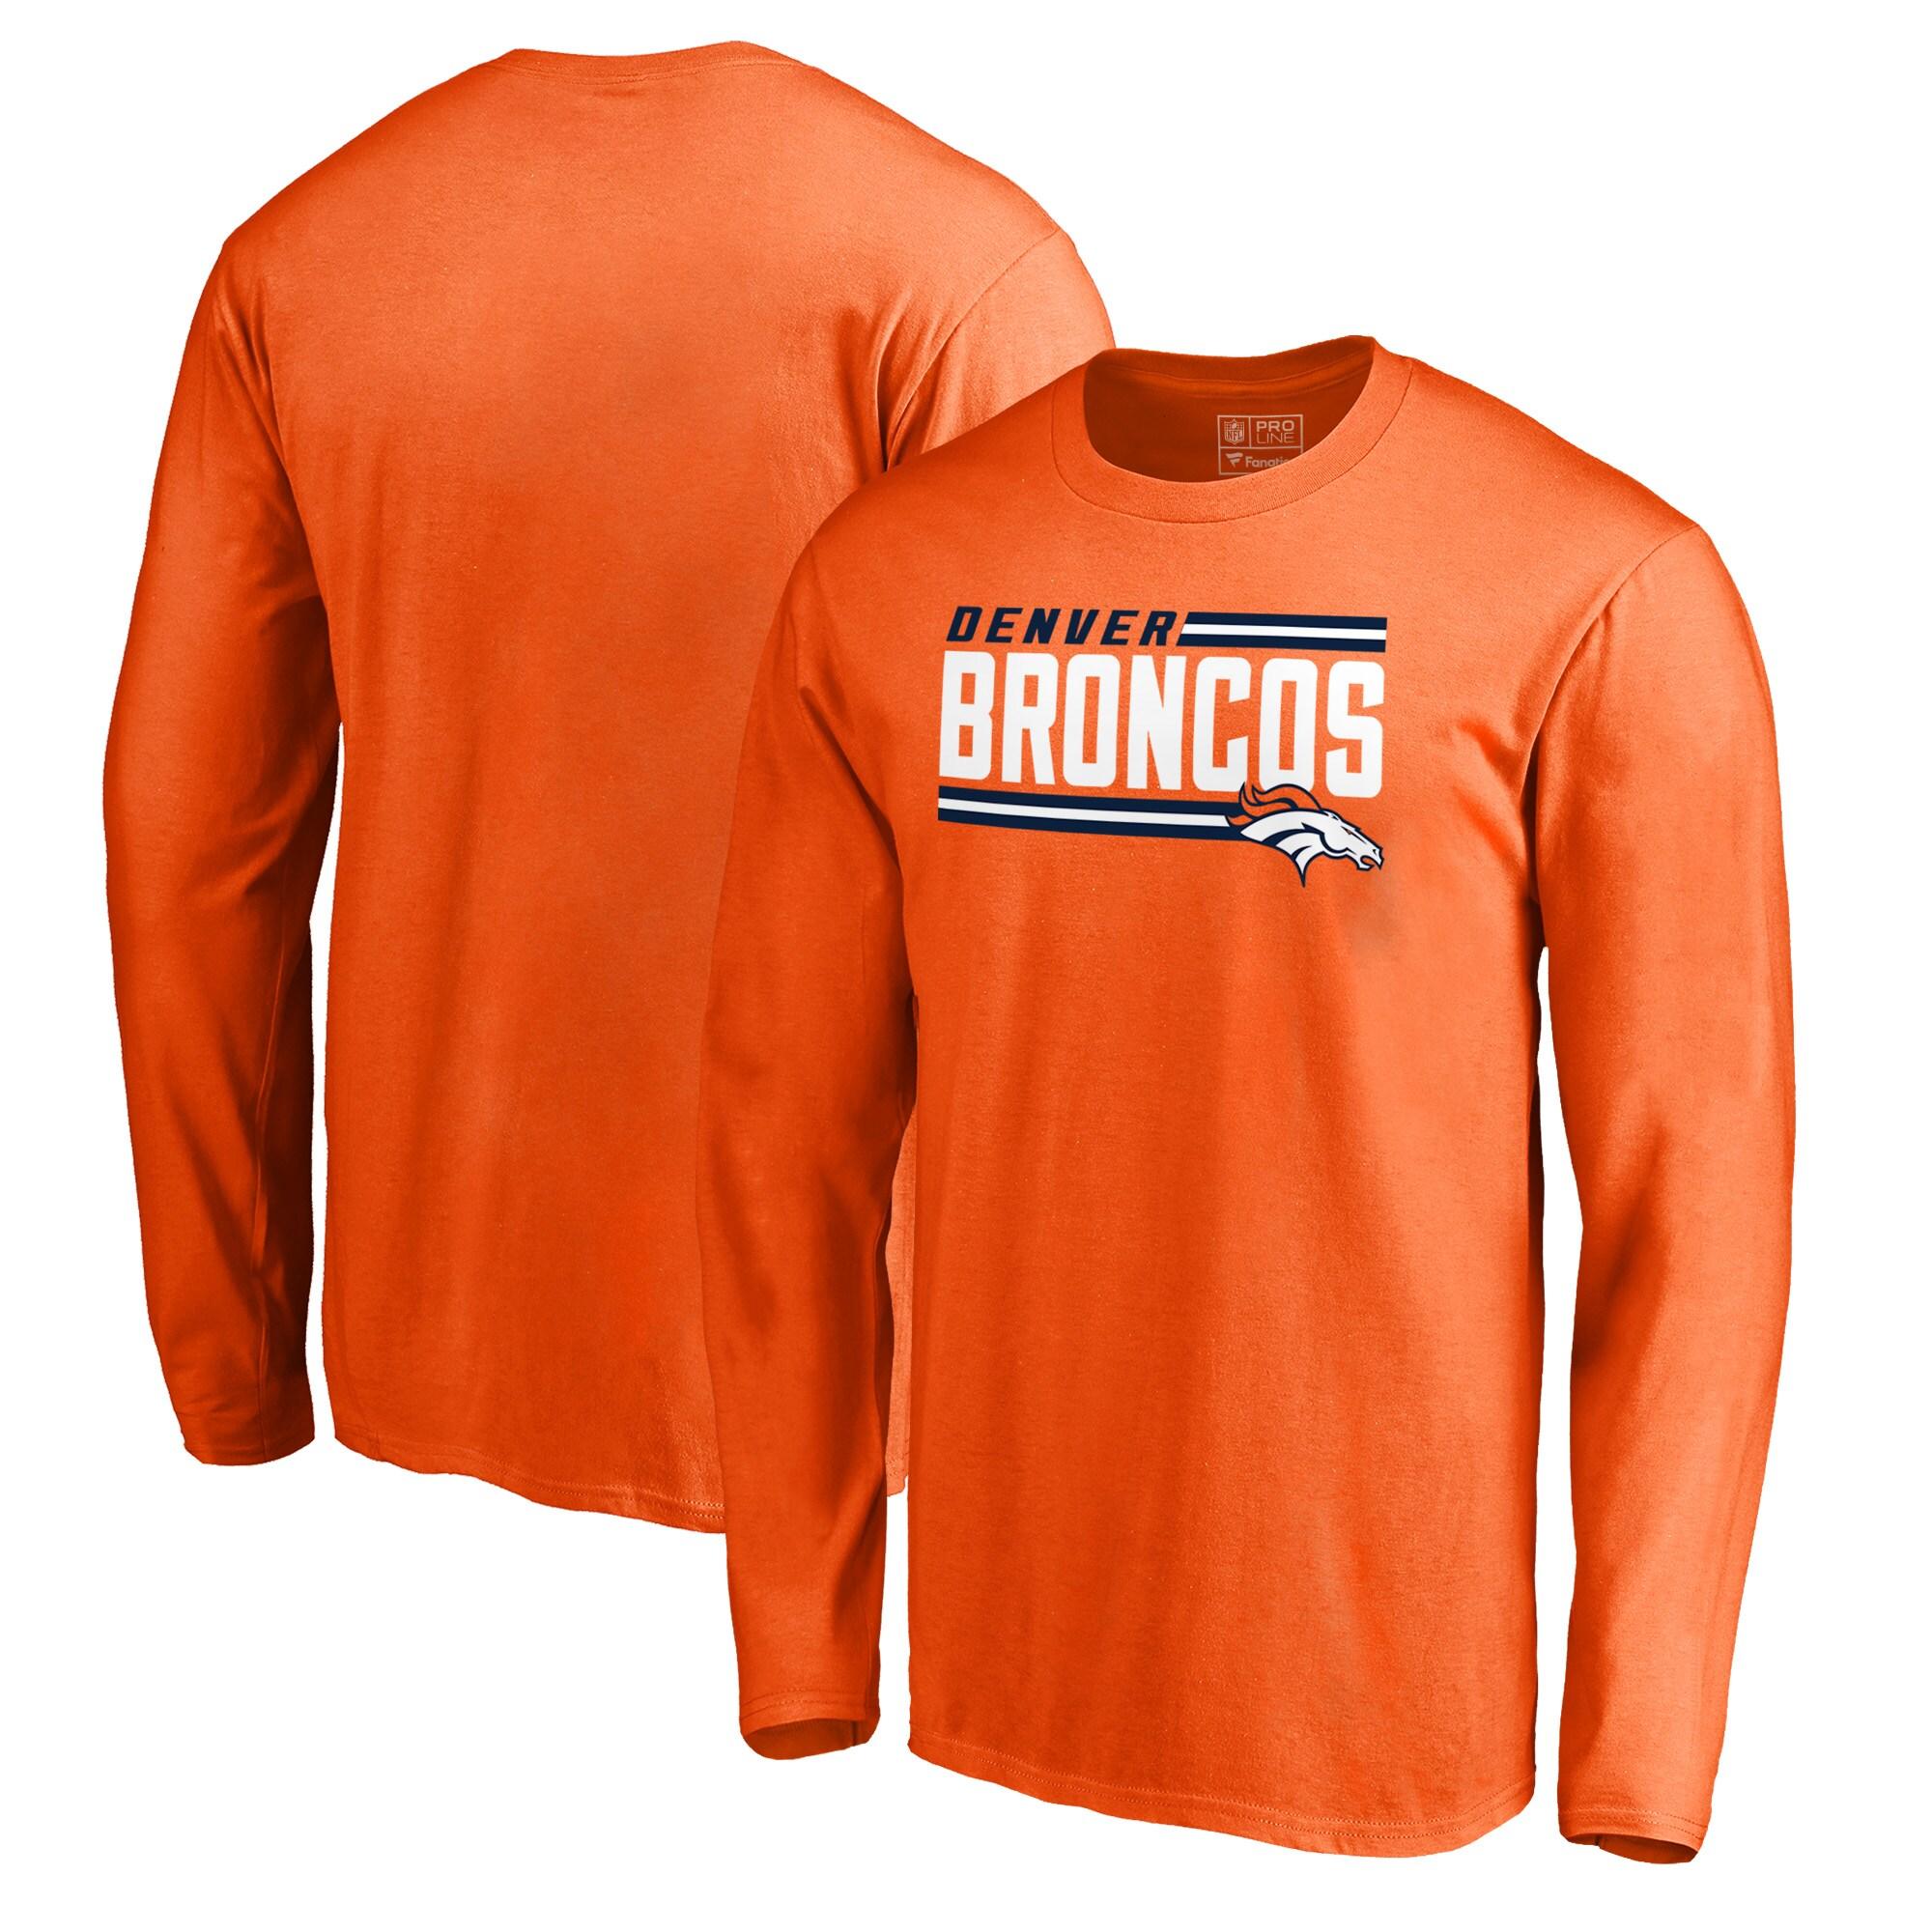 Denver Broncos NFL Pro Line by Fanatics Branded Iconic Collection On Side Stripe Long Sleeve T-Shirt - Orange